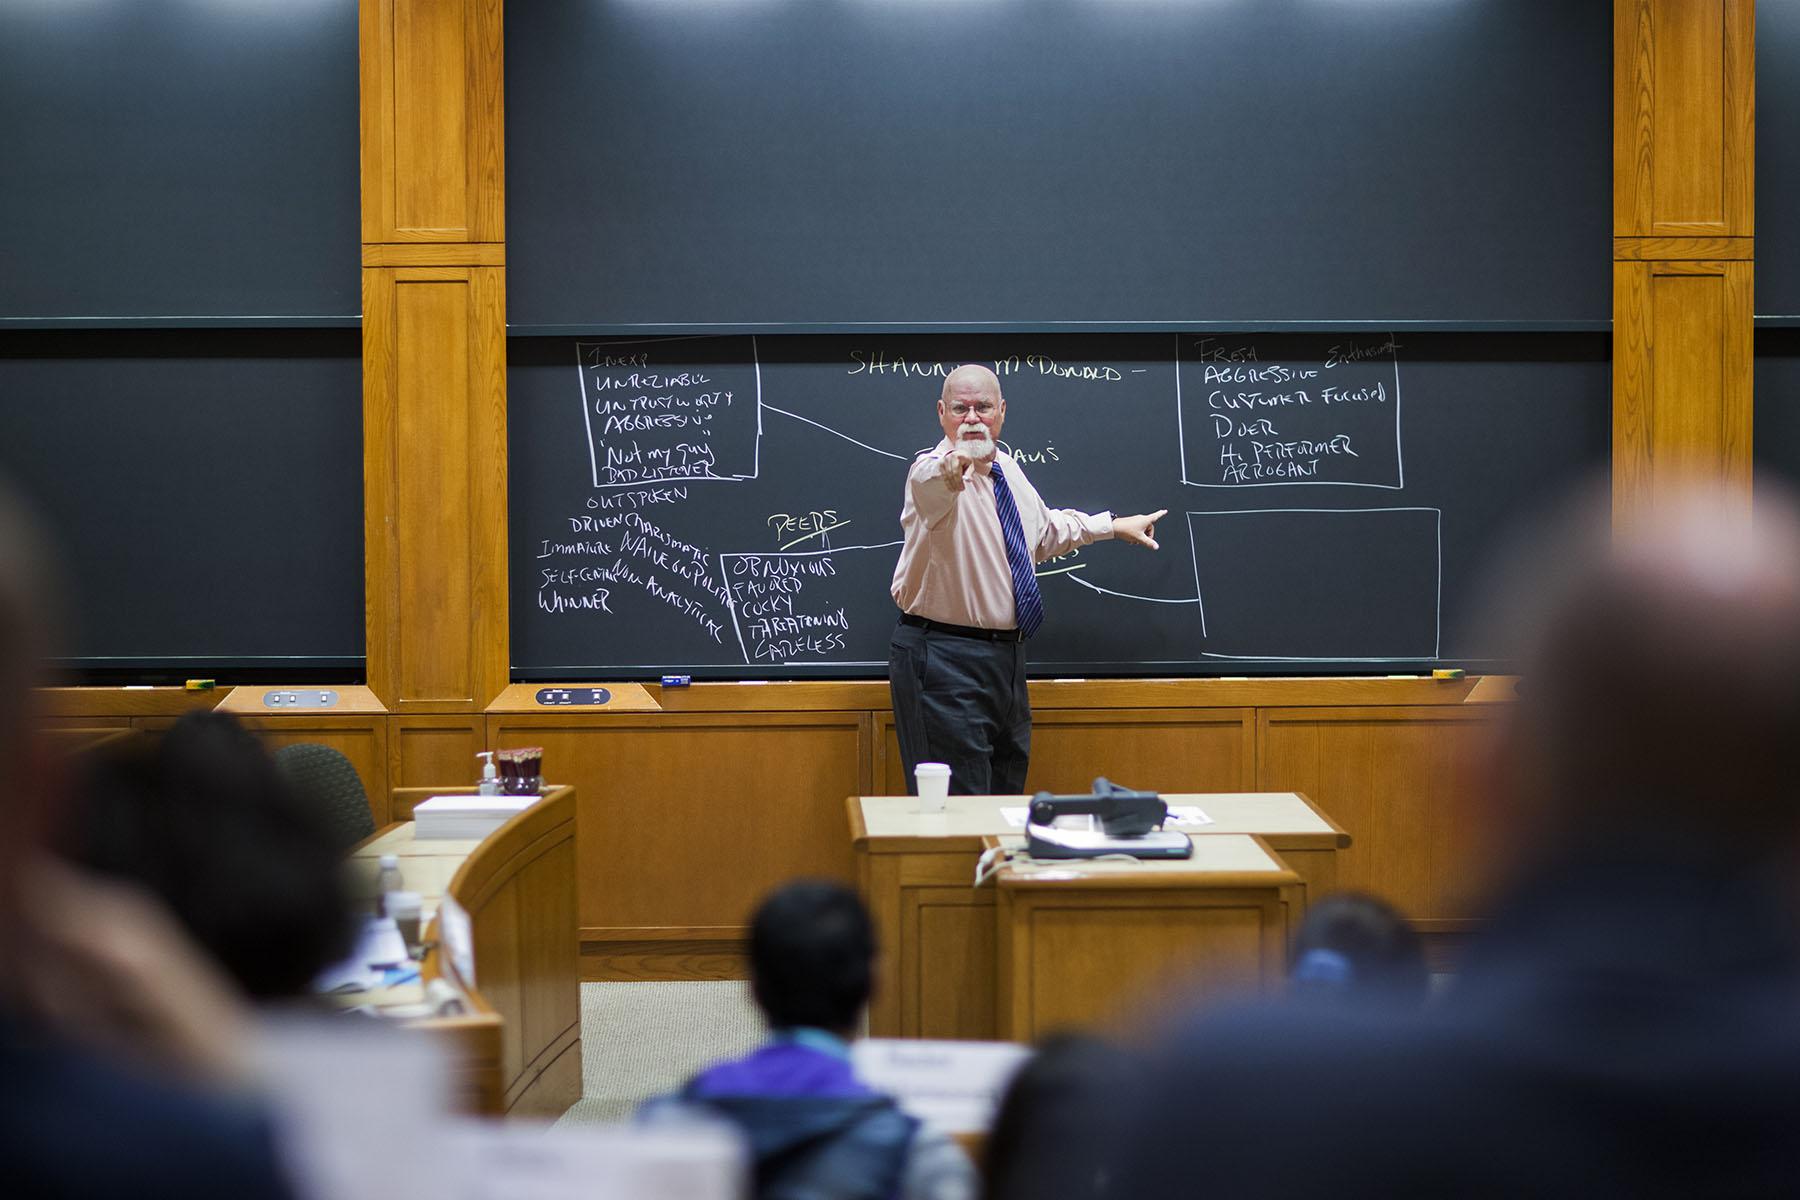 Harvard Business School in Boston